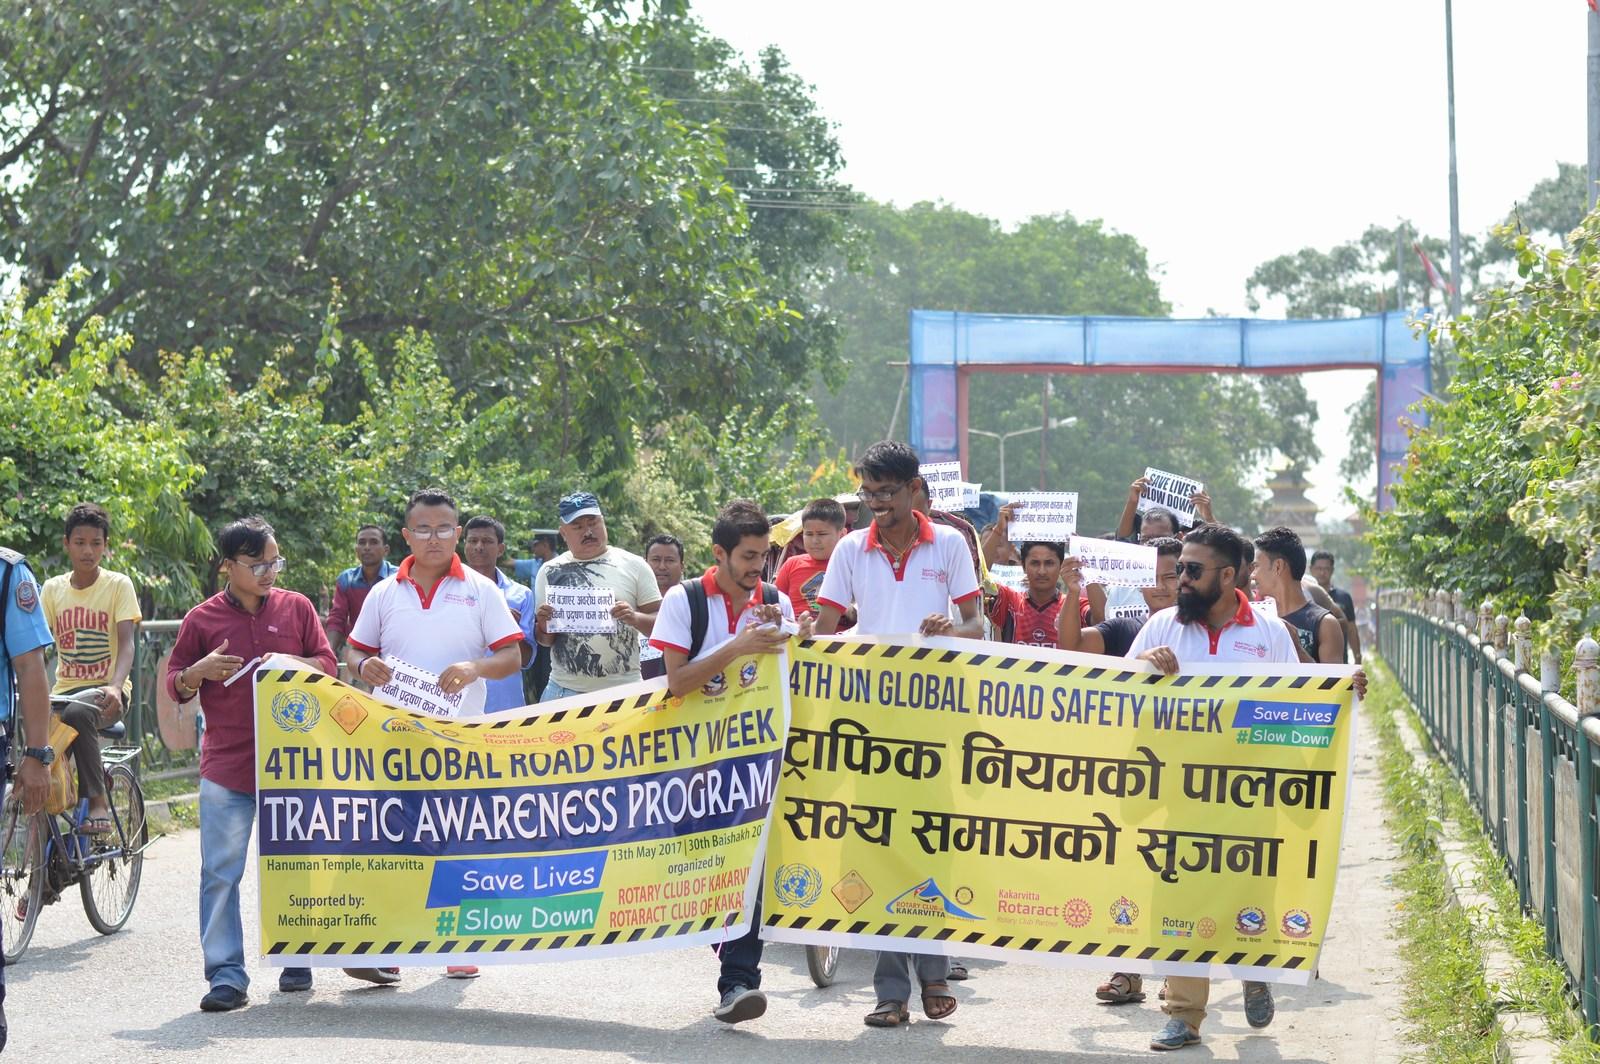 4th-UN-Global-Road-Safety-Week-2017-Traffic-Awareness-Program-Rotary-club-of-Kakarvitta-40